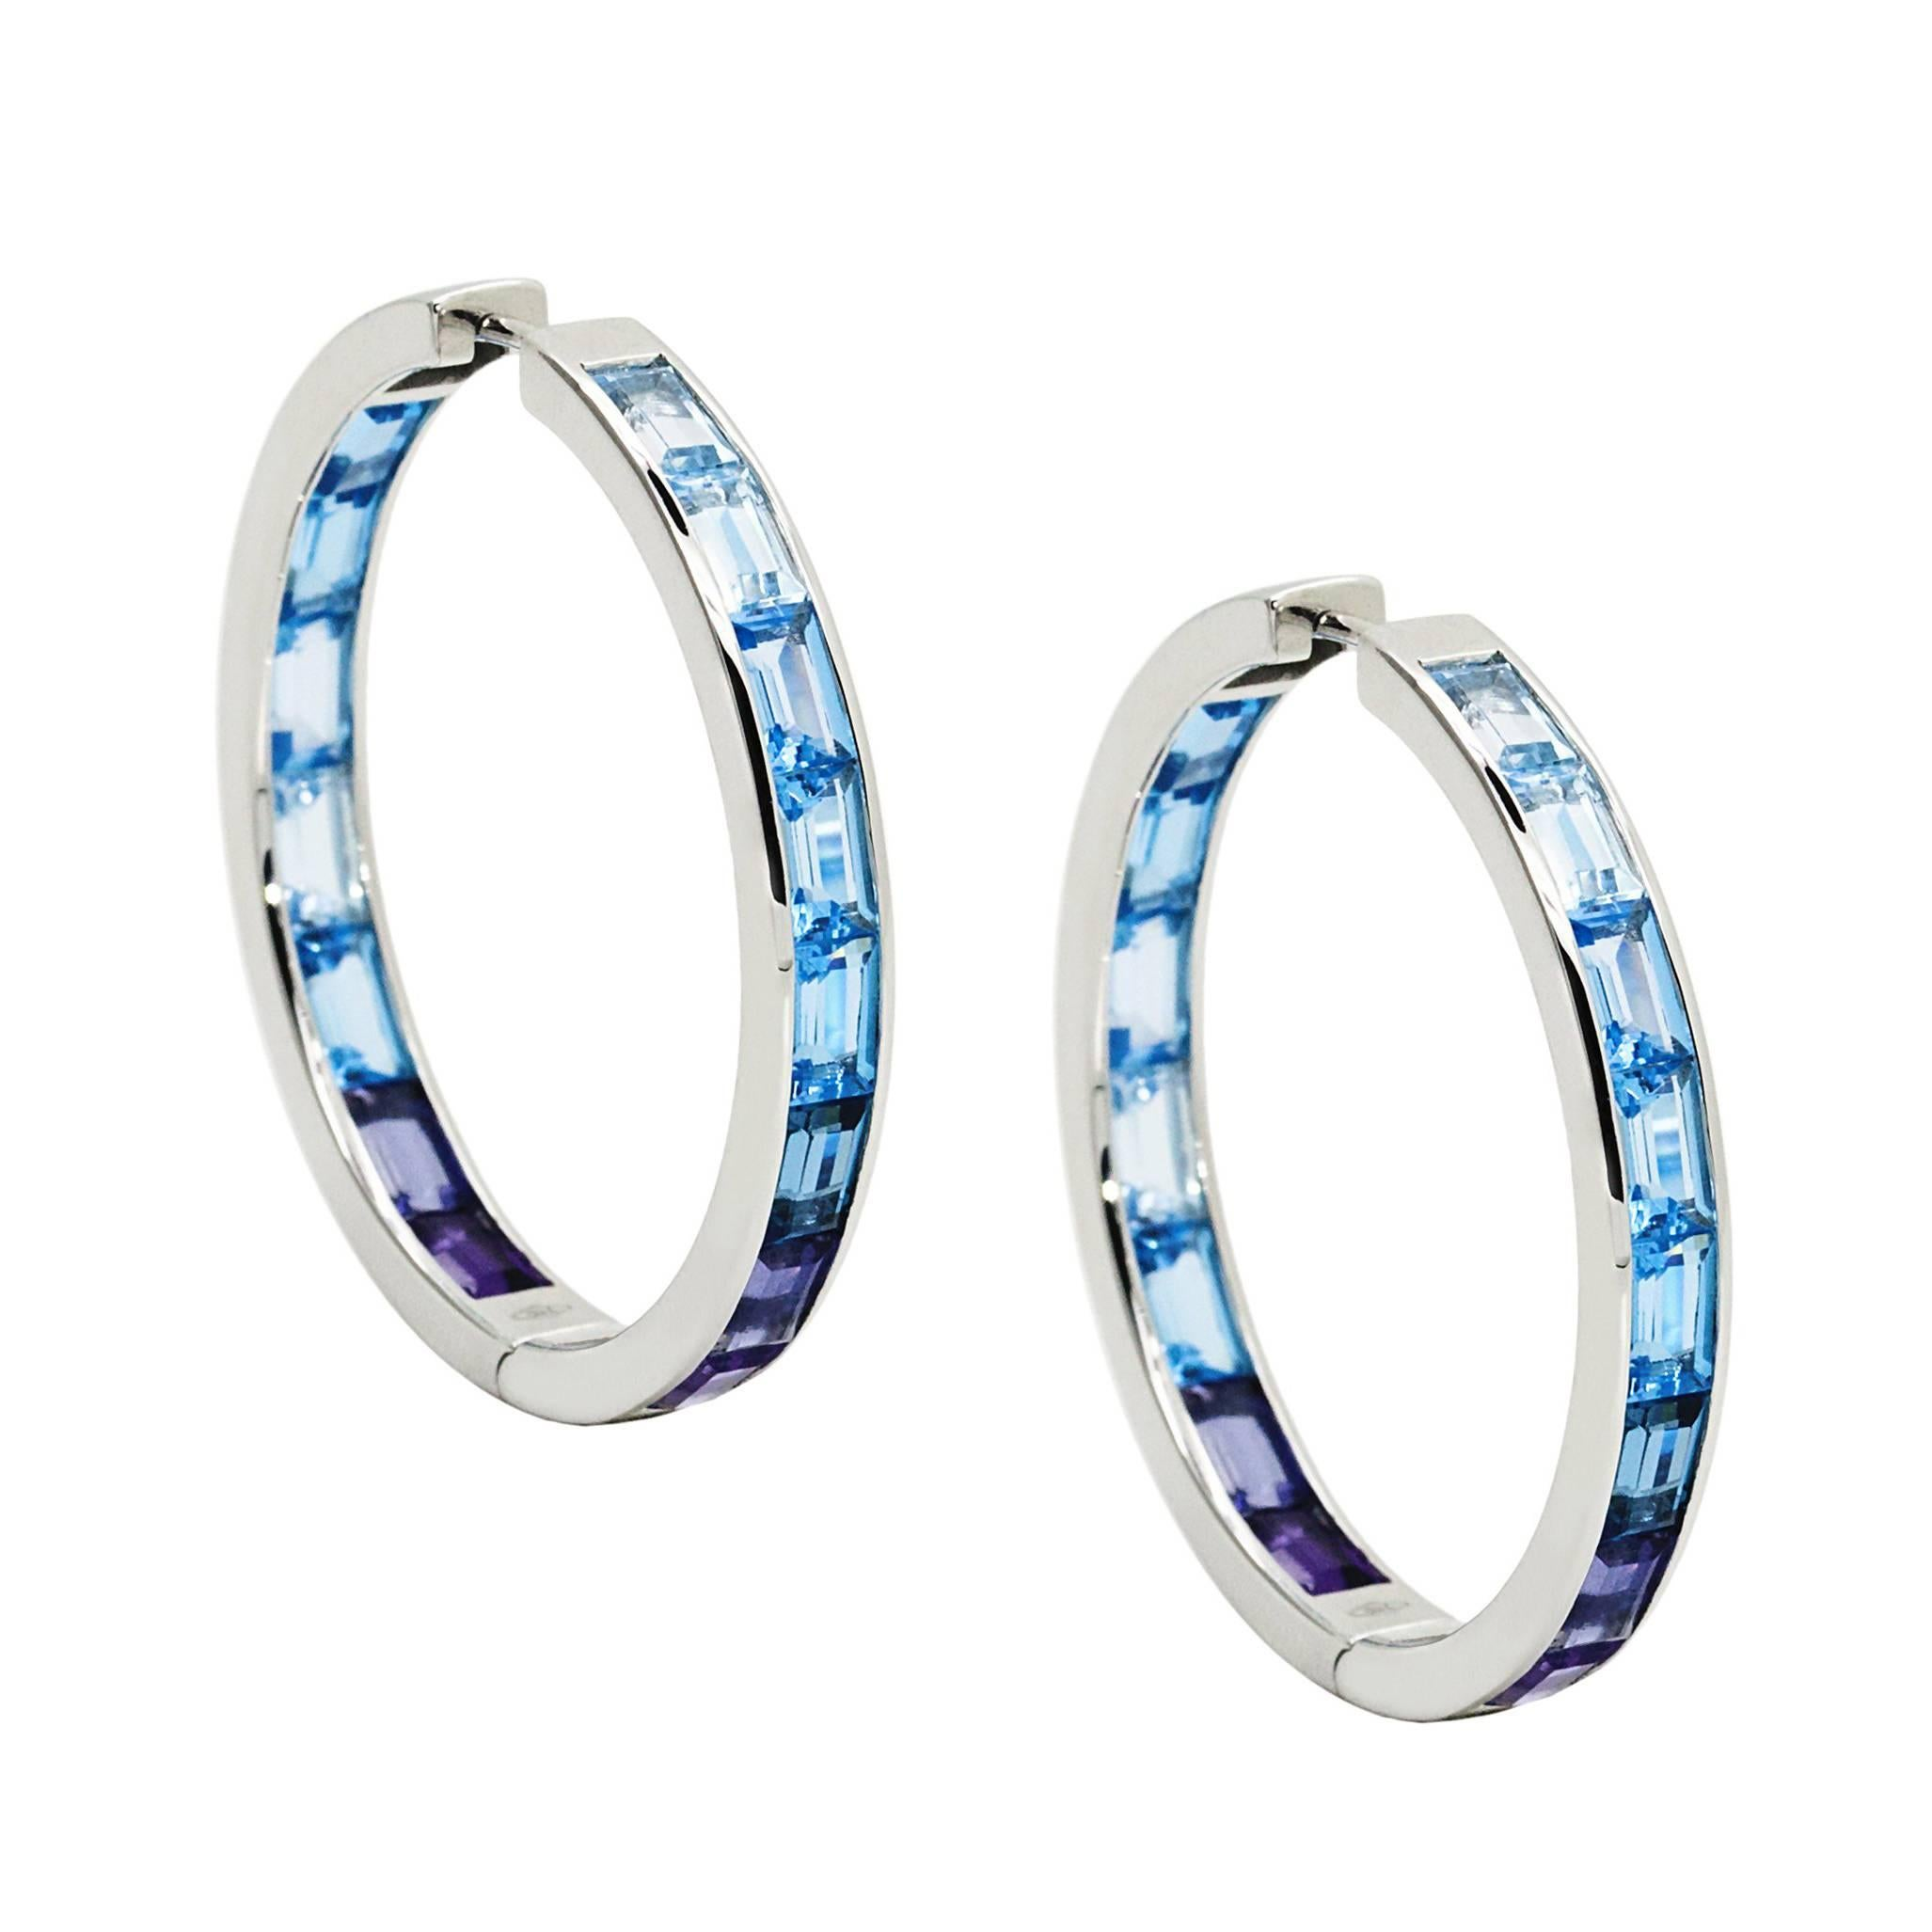 Daou Jewellery 18kt White Gold, Amethyst & Iolite Morning Hoop Earrings